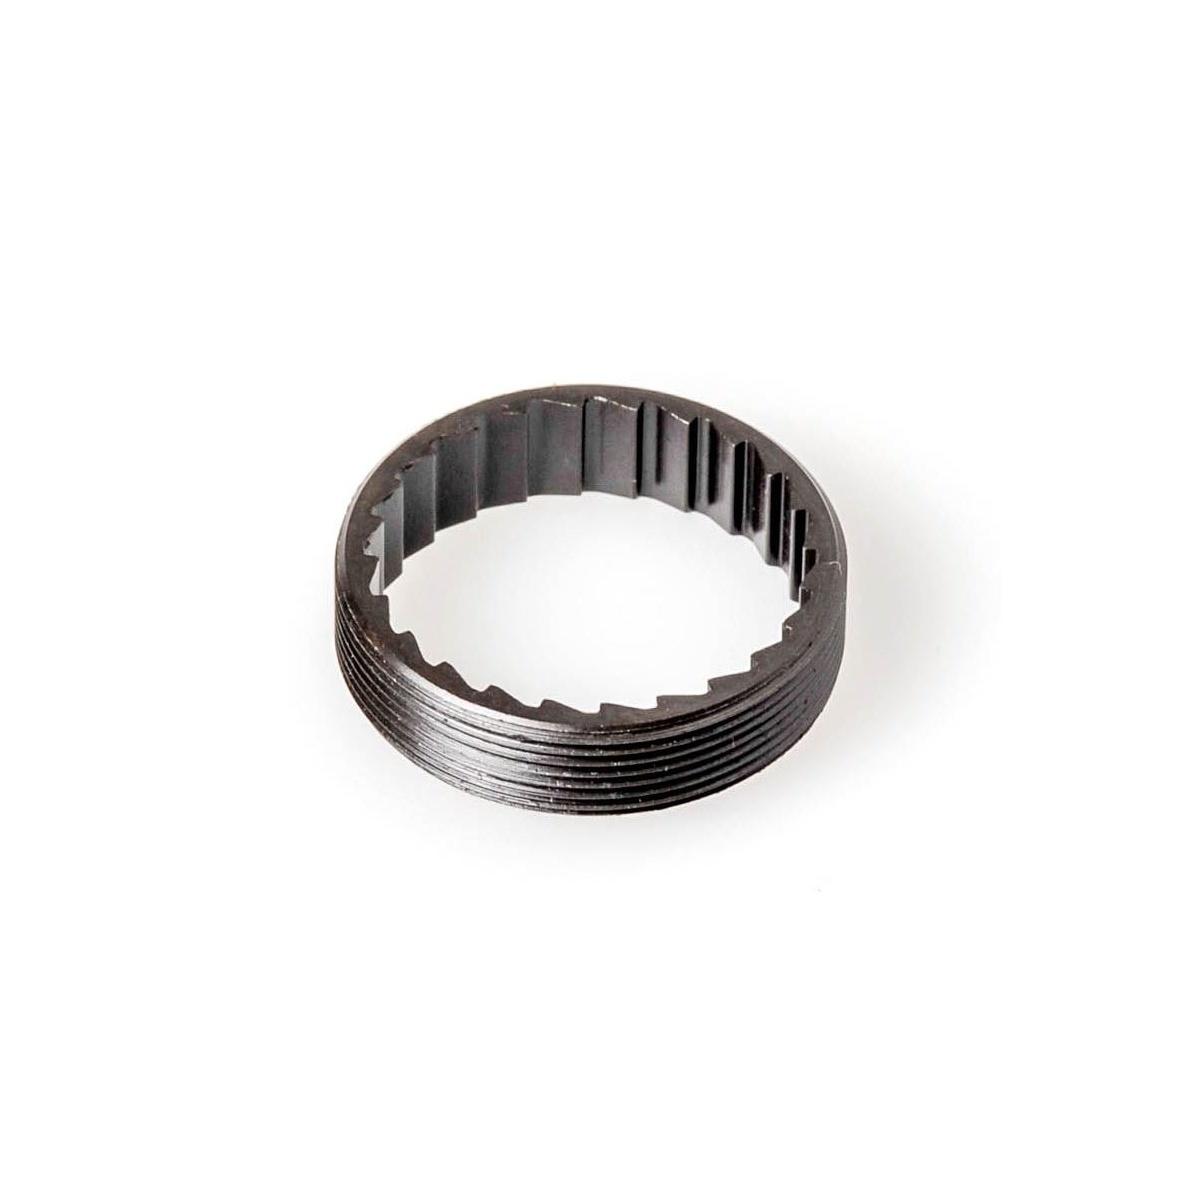 RING NUT STEEL M34X1 3P-1